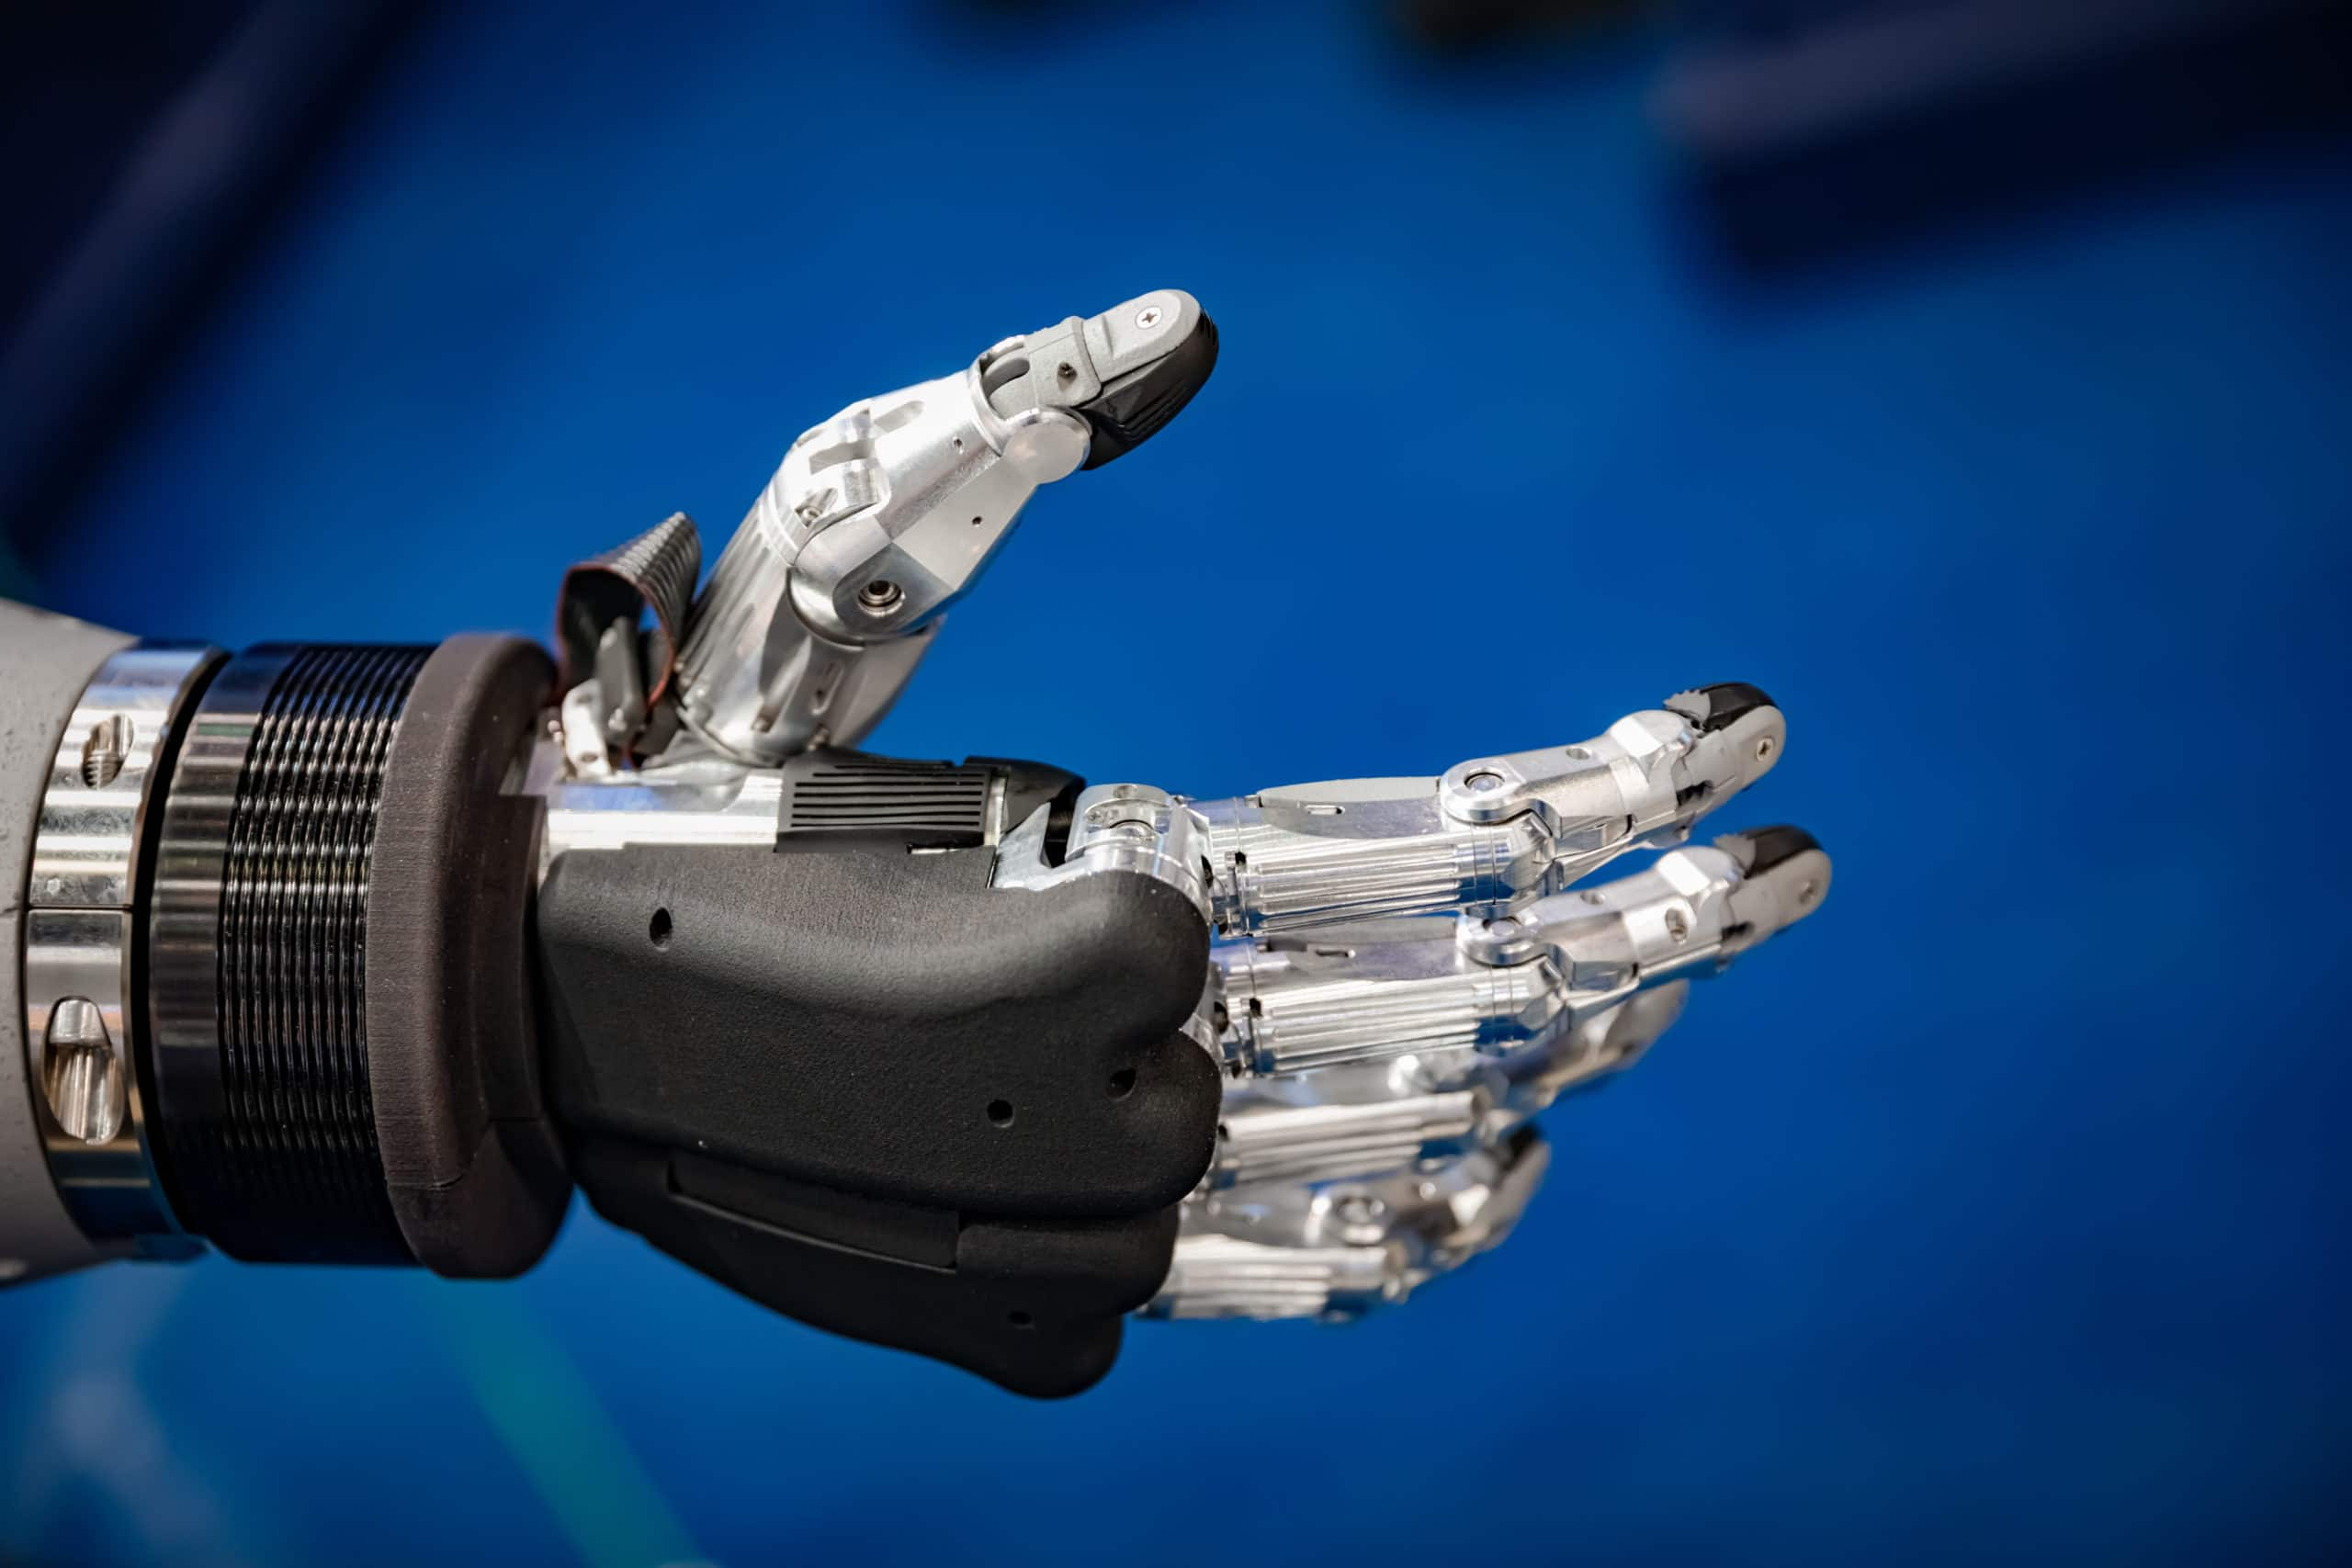 Futuristic Robotic Hand for a handshake